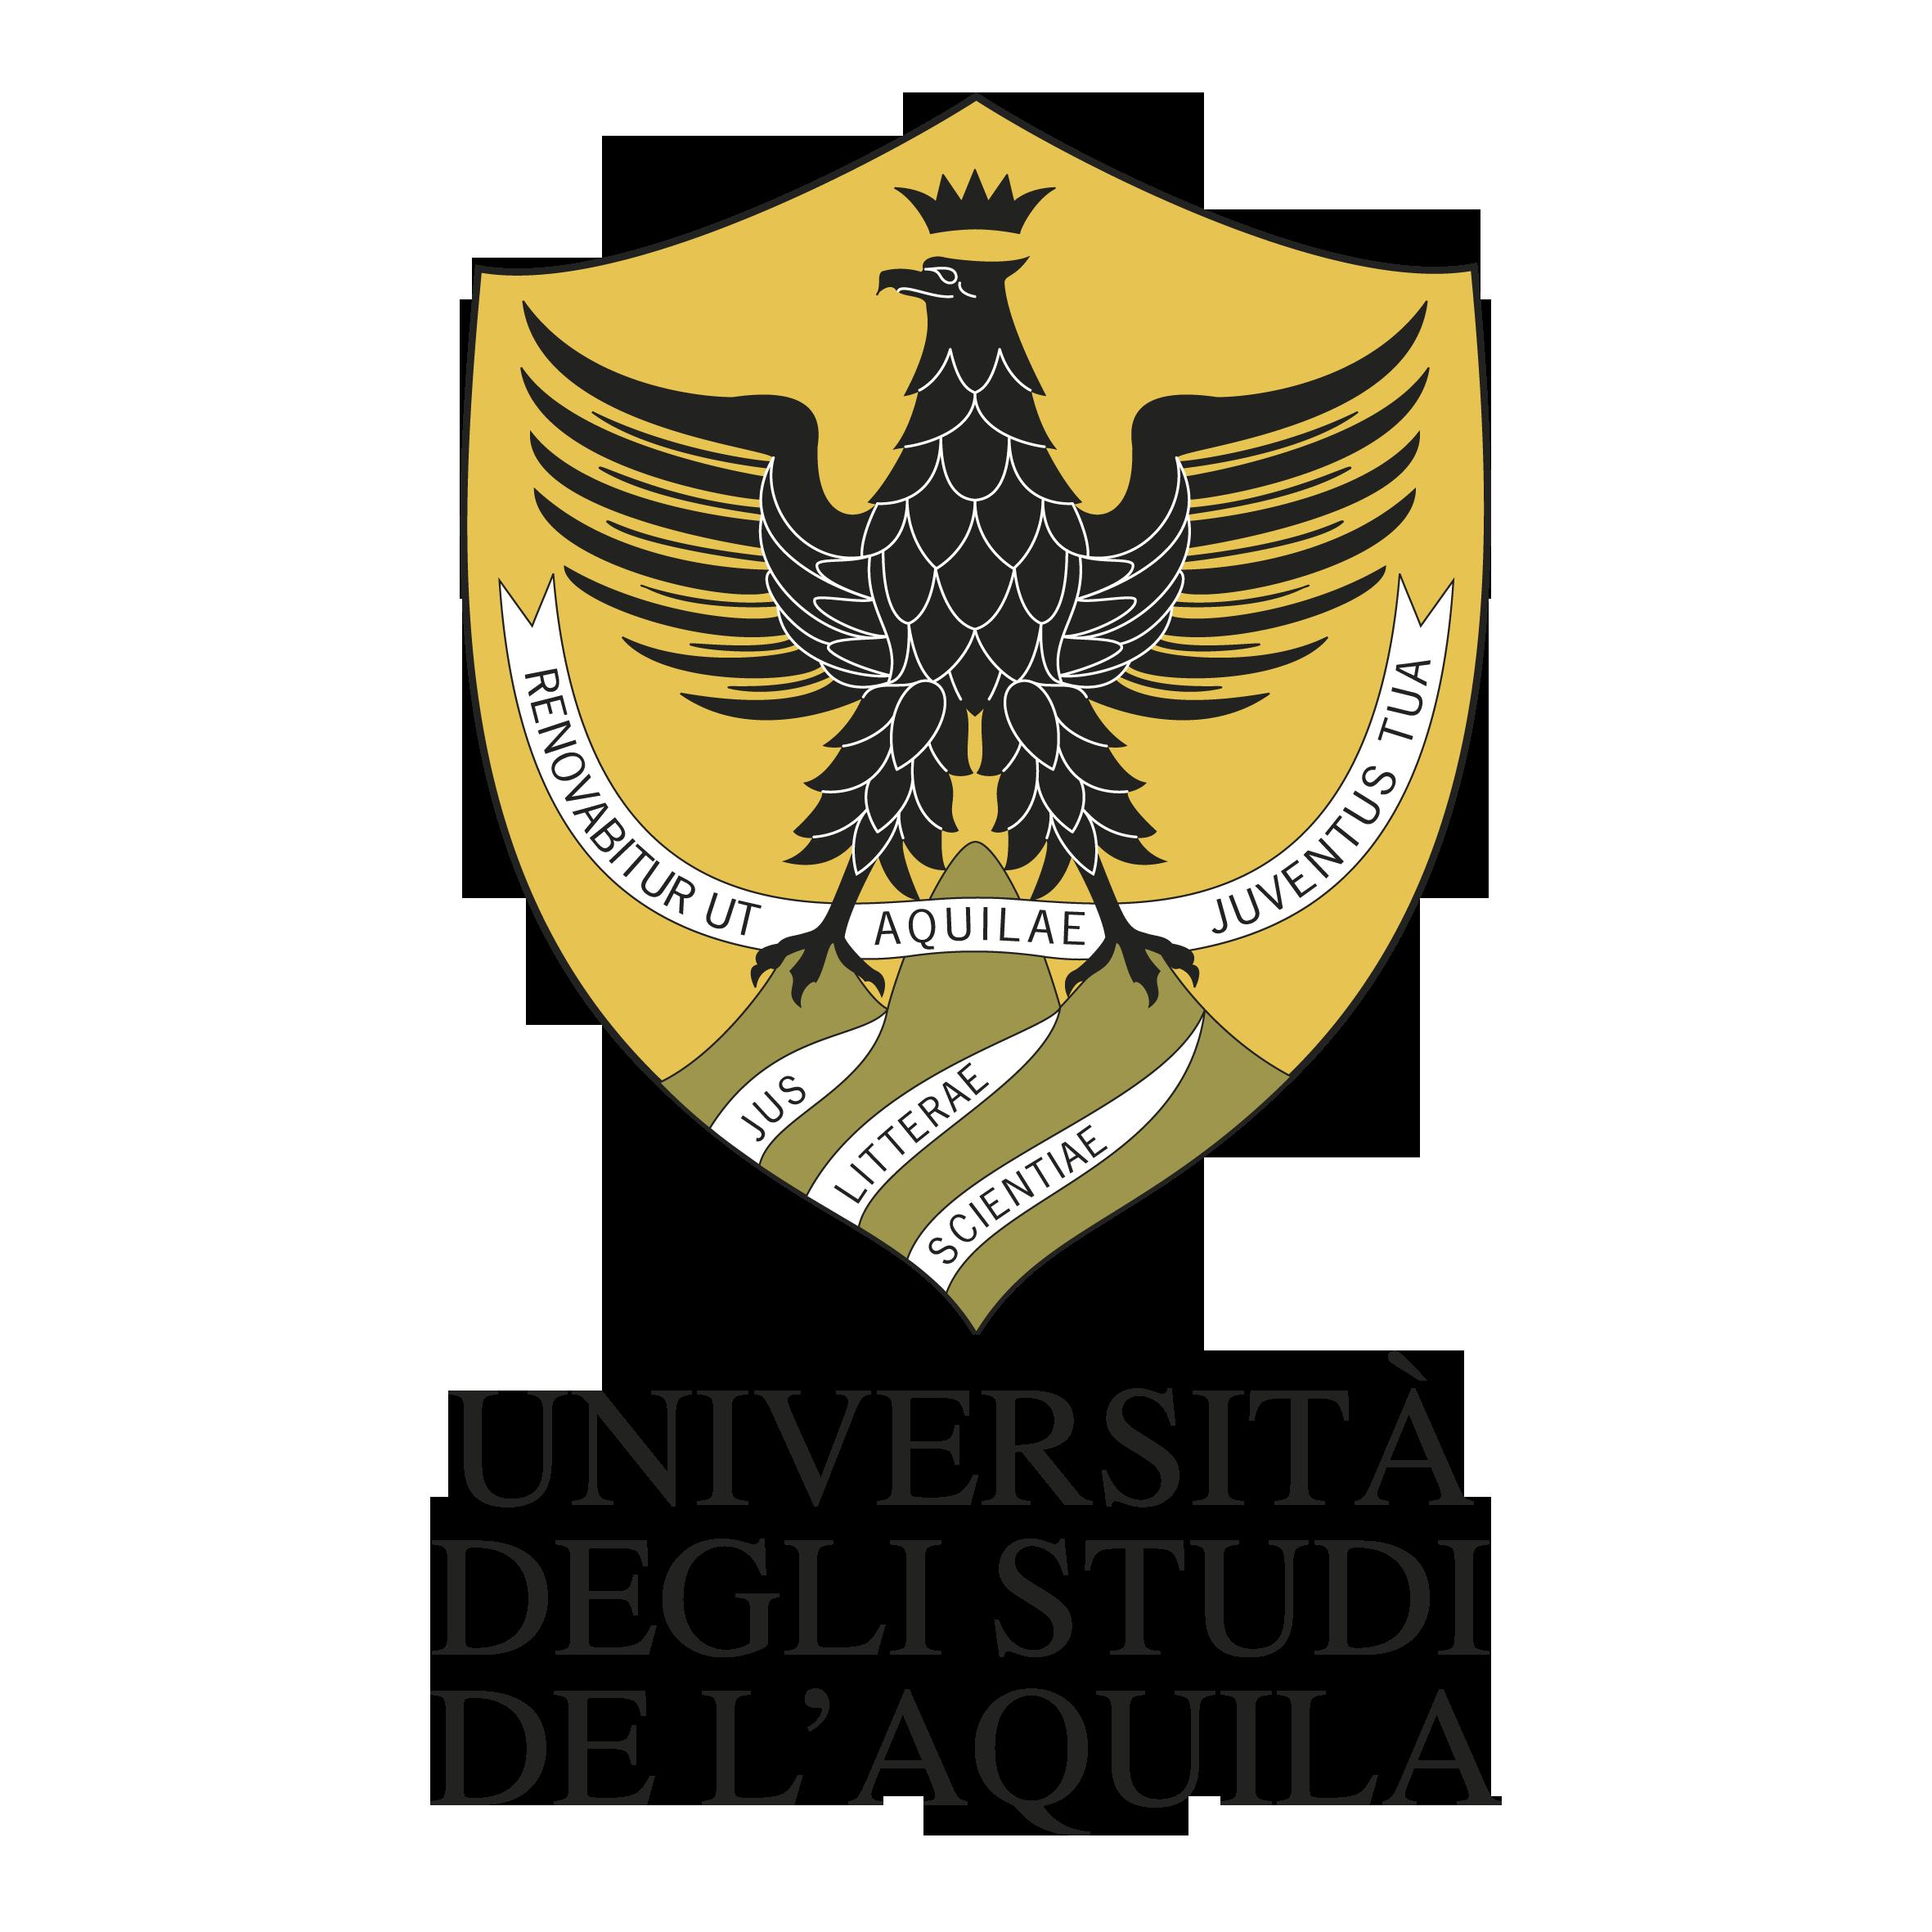 Univaqlogo